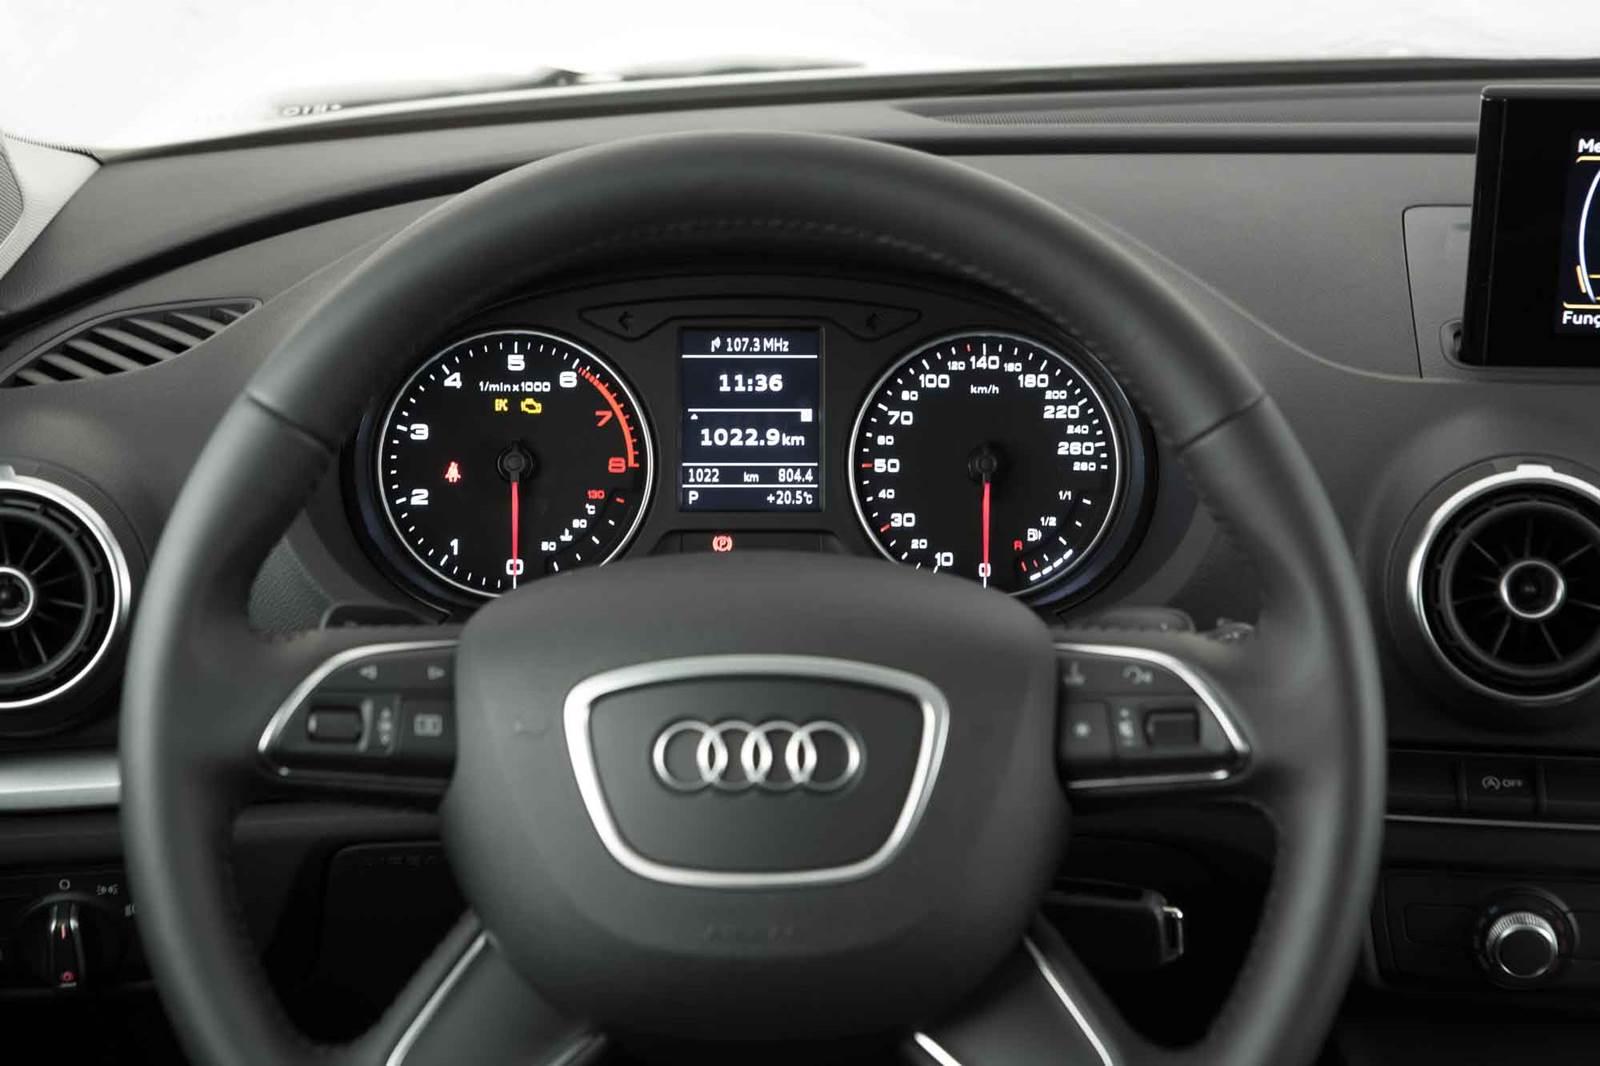 audi a3 sedan nacional terá motor flex com start/stop | car.blog